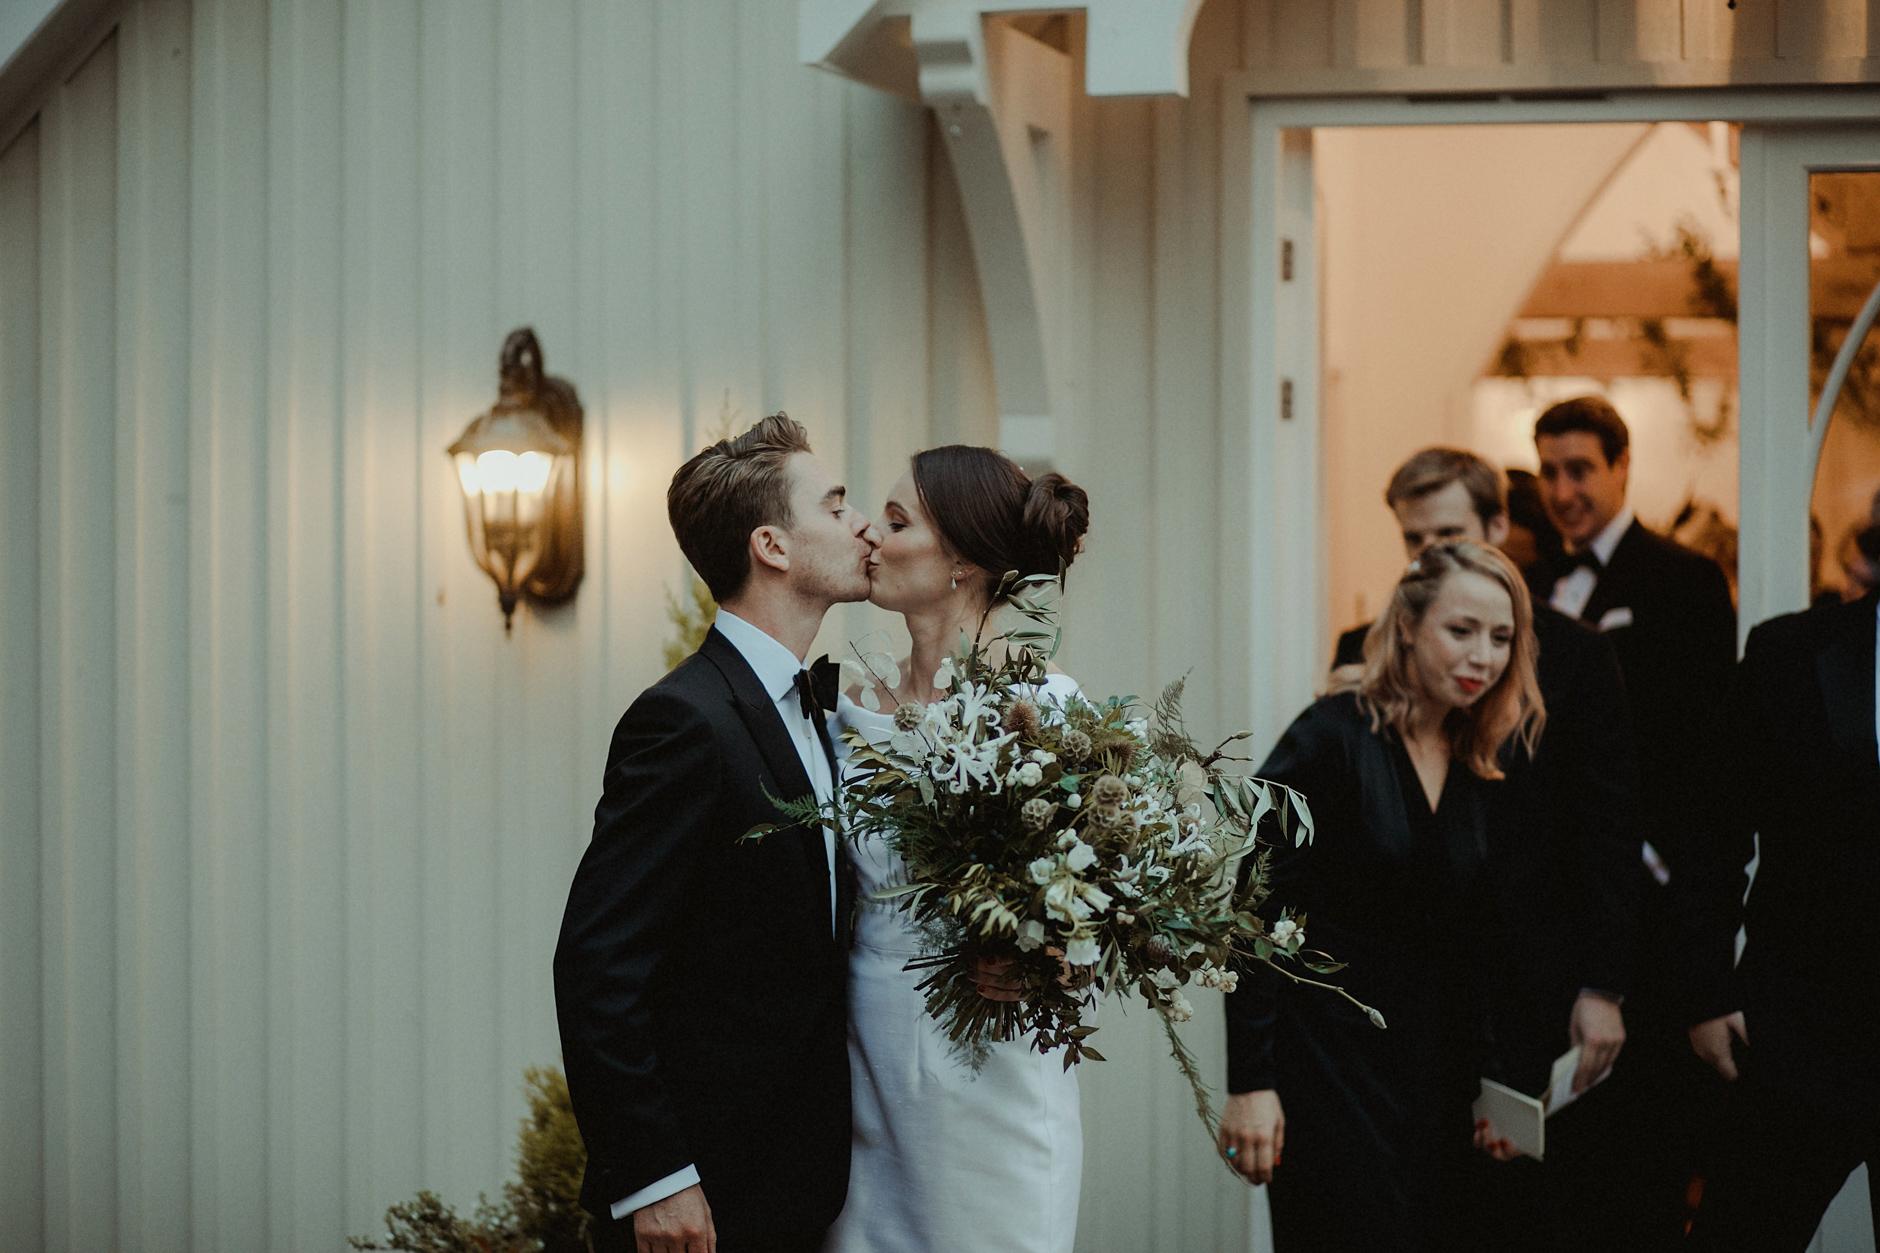 Glentruim-Wedding-Nikki-Leadbetter-Photography-123.jpg